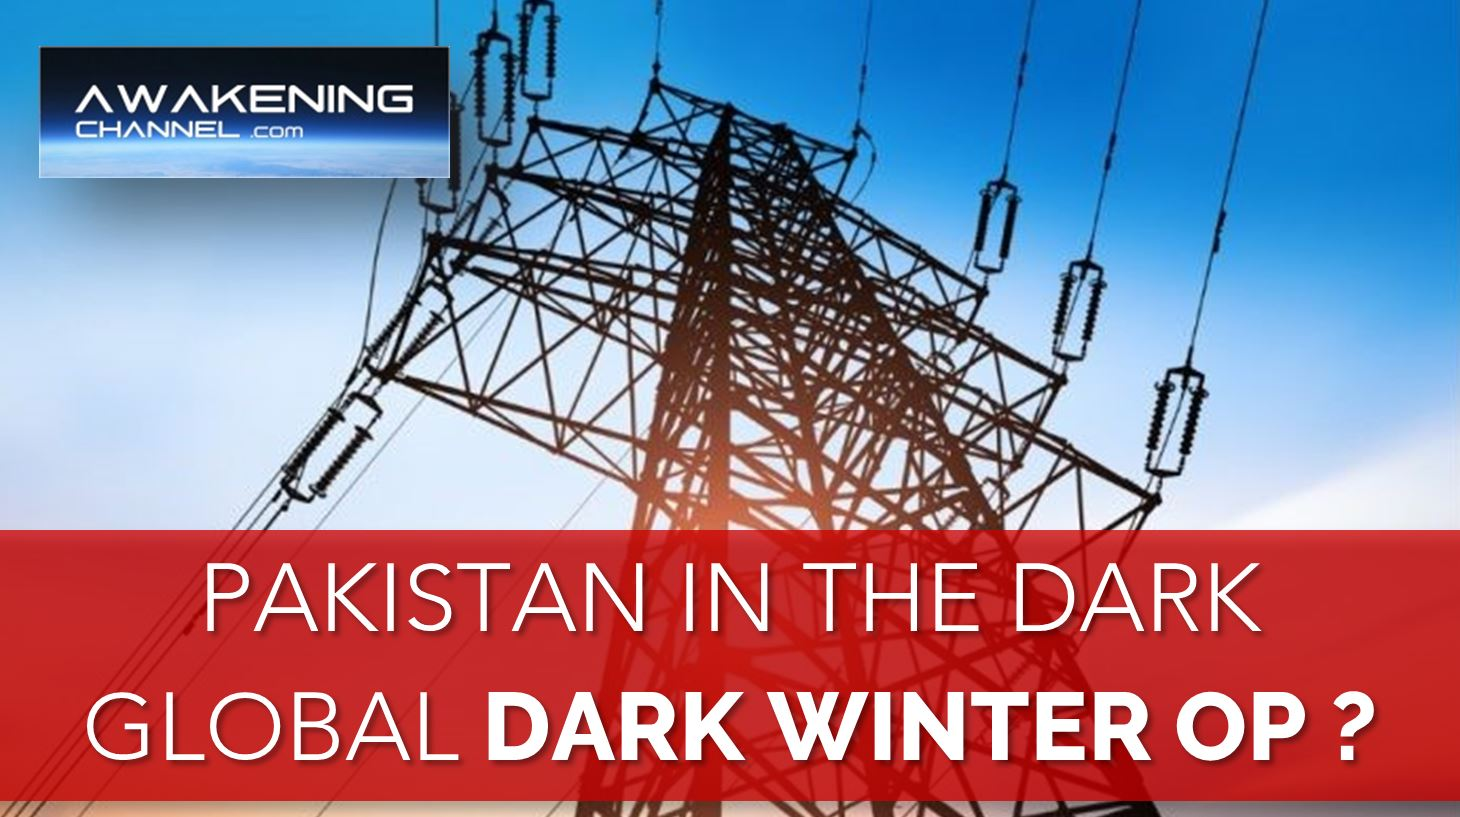 Nationwide Power Blackout Leaves Pakistan in the Dark, Operation Dark Winter? || Awakening Channel